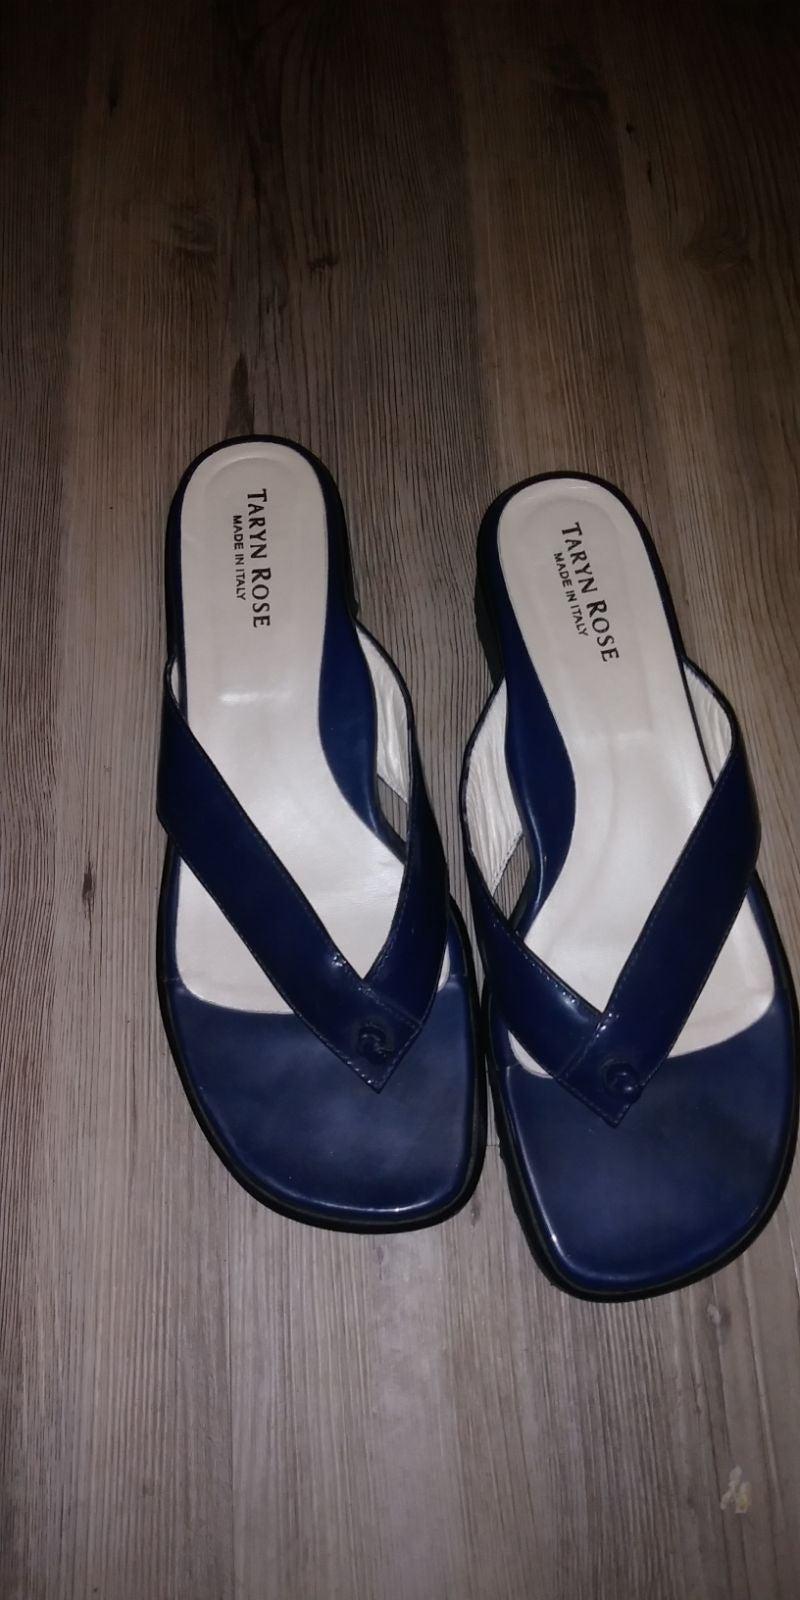 Taryn Rose sandals size 8 navy